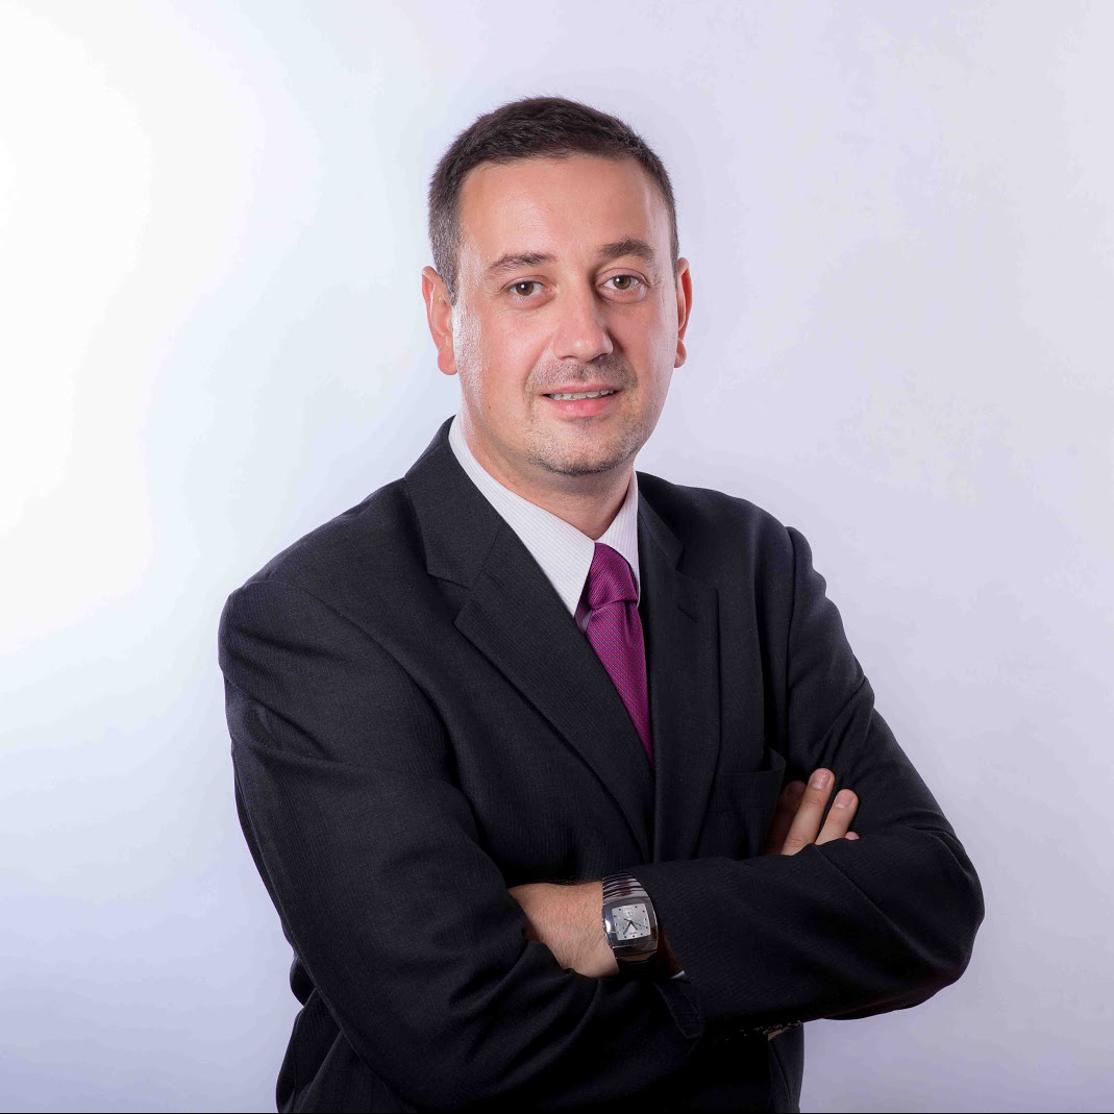 Miljan Gutovic